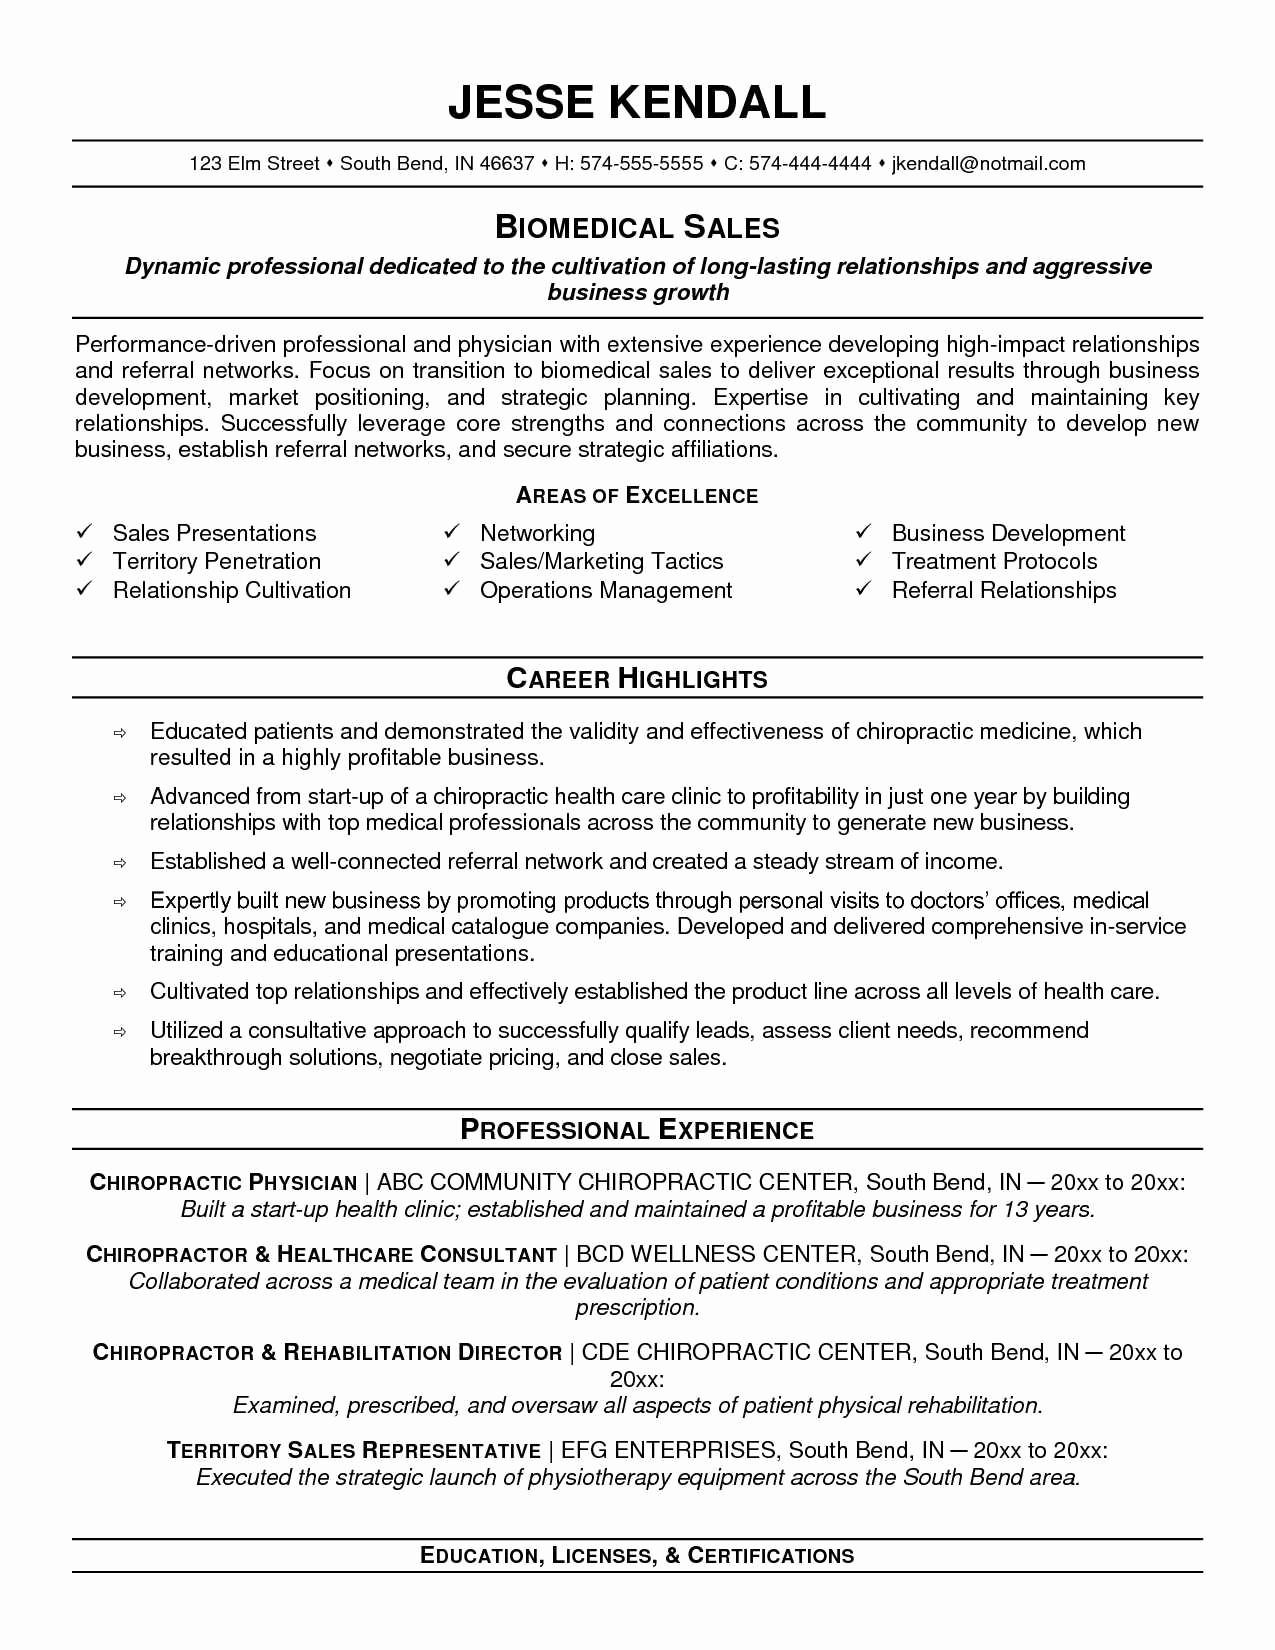 Free Functional Resume Template 2018 Beautiful 41 Good Functional Resume Template 2018 Xb E